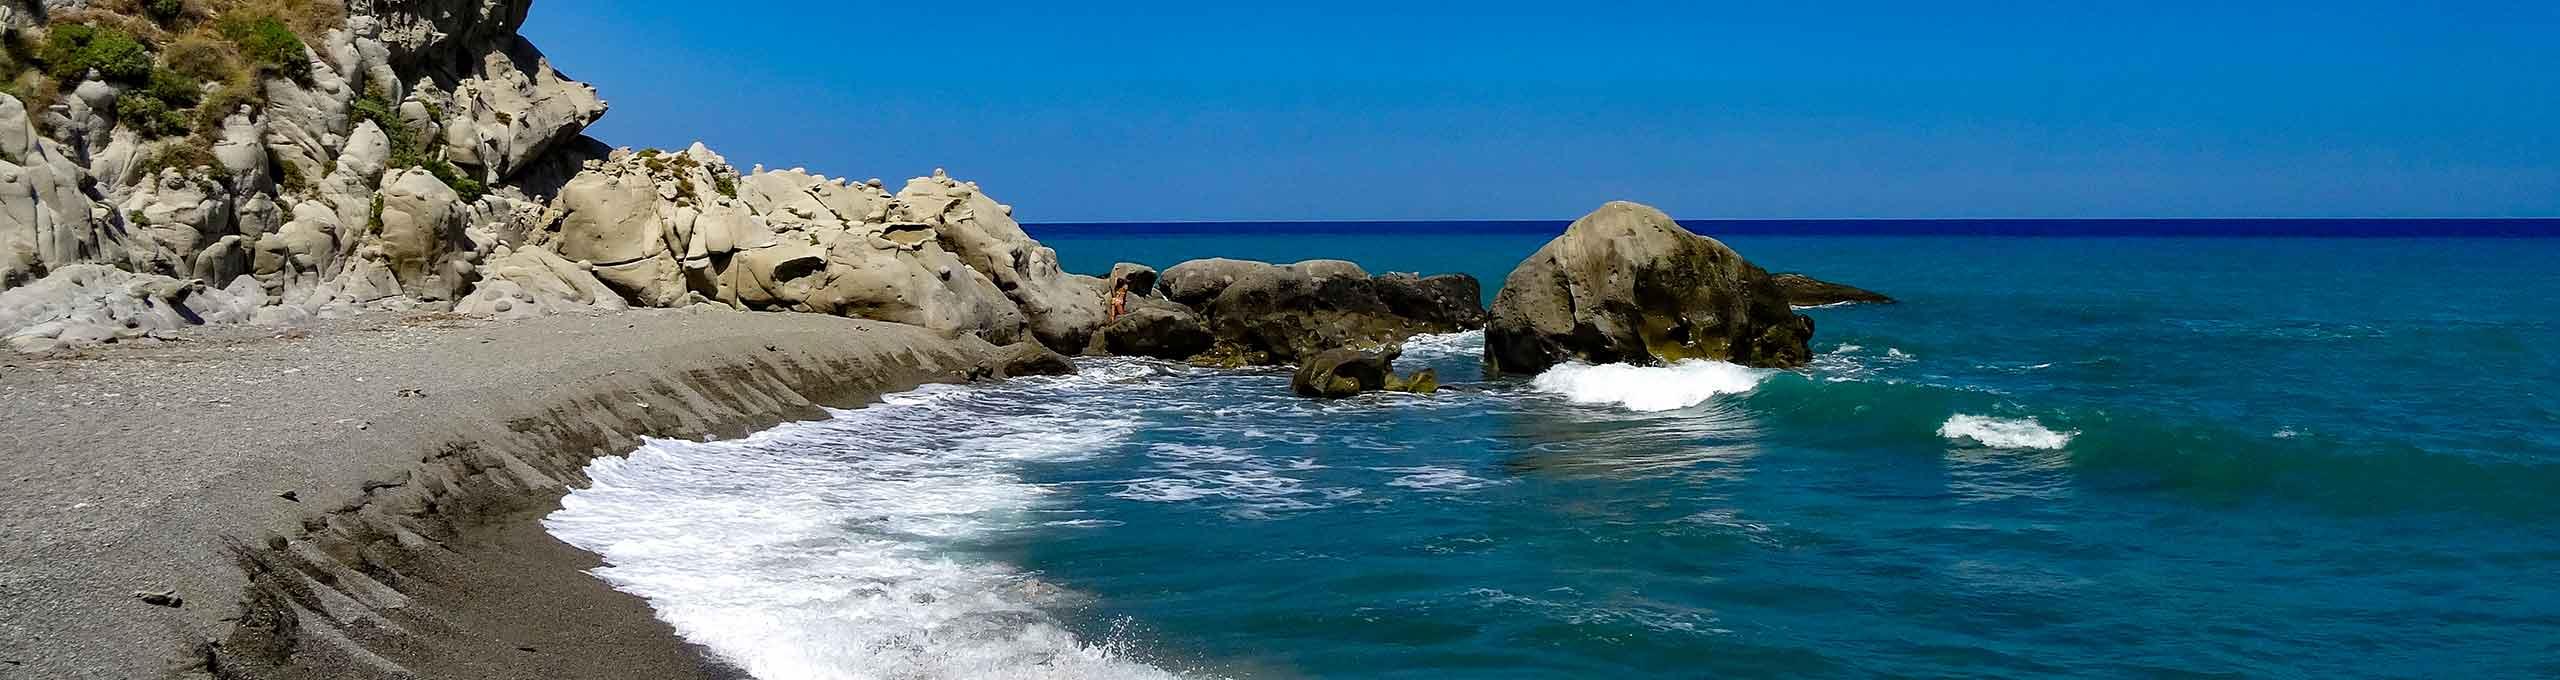 Brancaleone, Riviera dei Gelsomini, Calabria